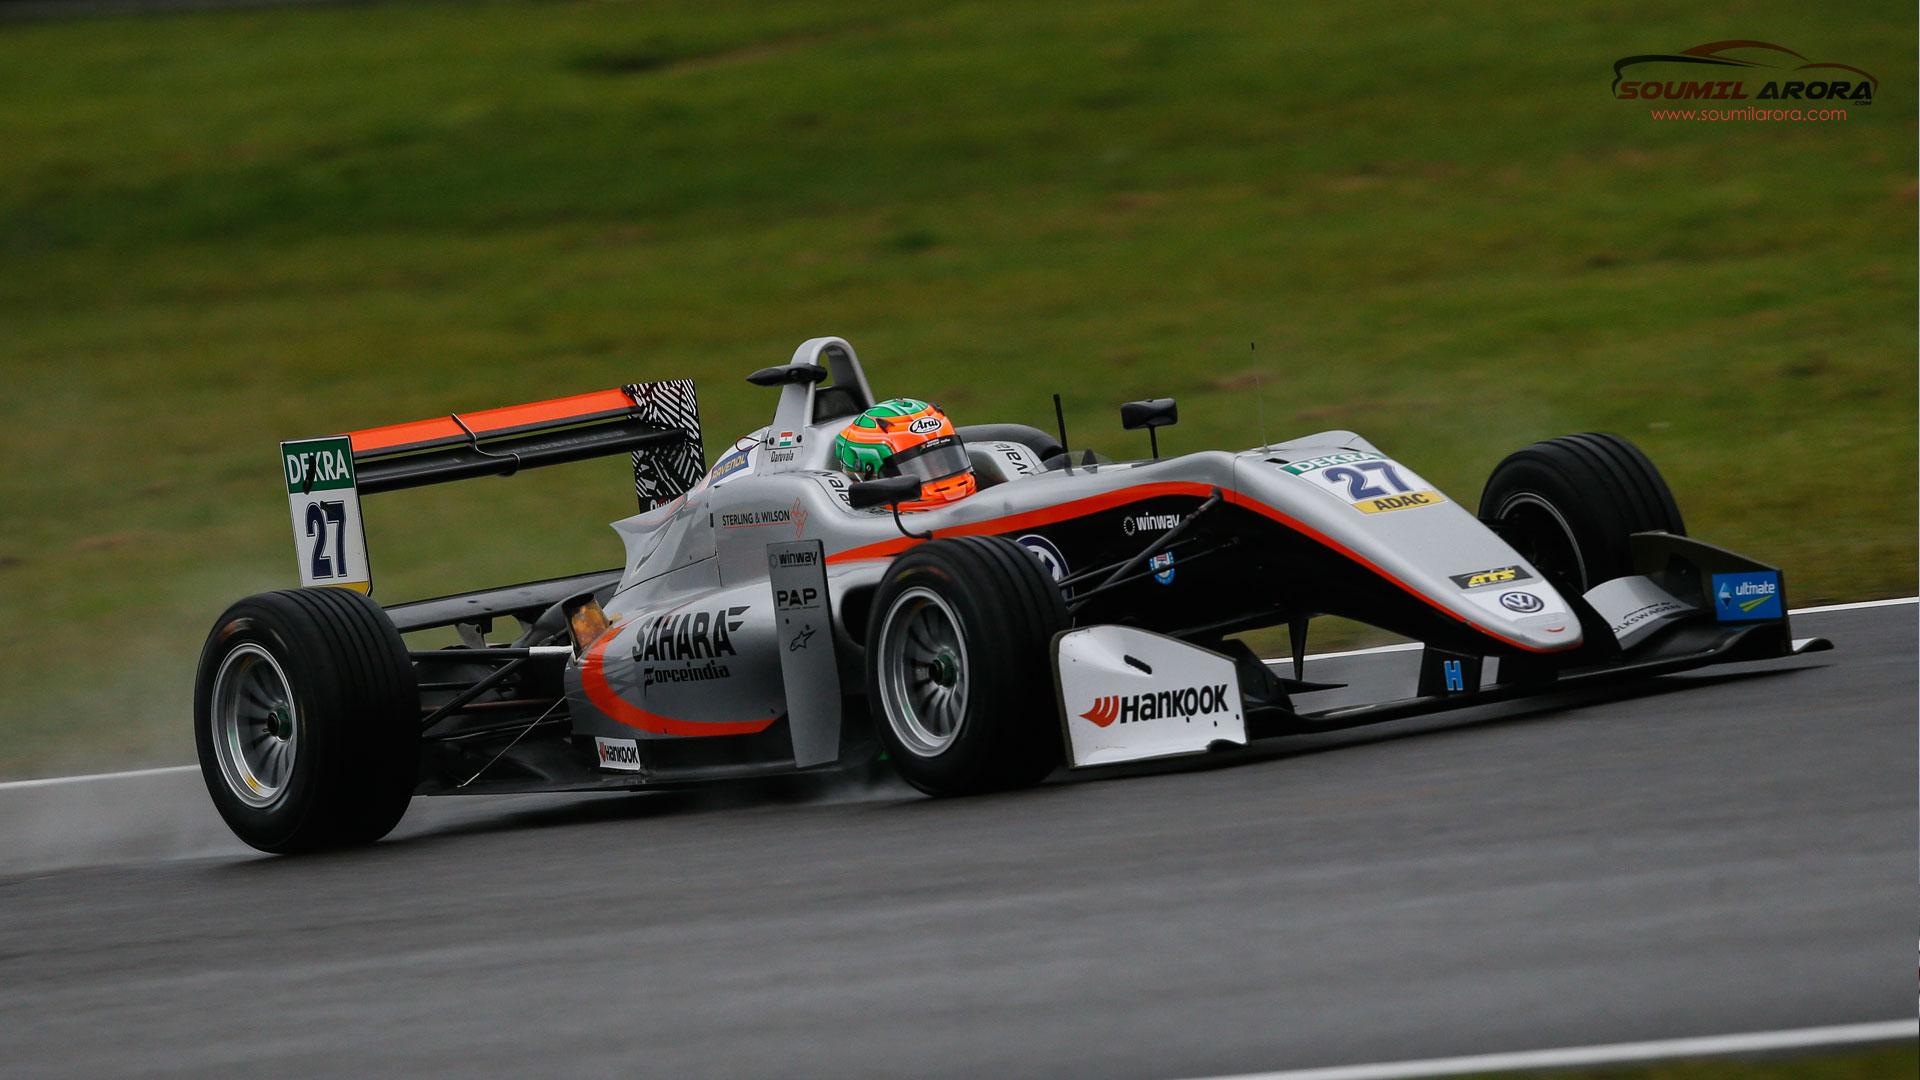 Jehan Daruvala Racing at Nurburgring Racetrack